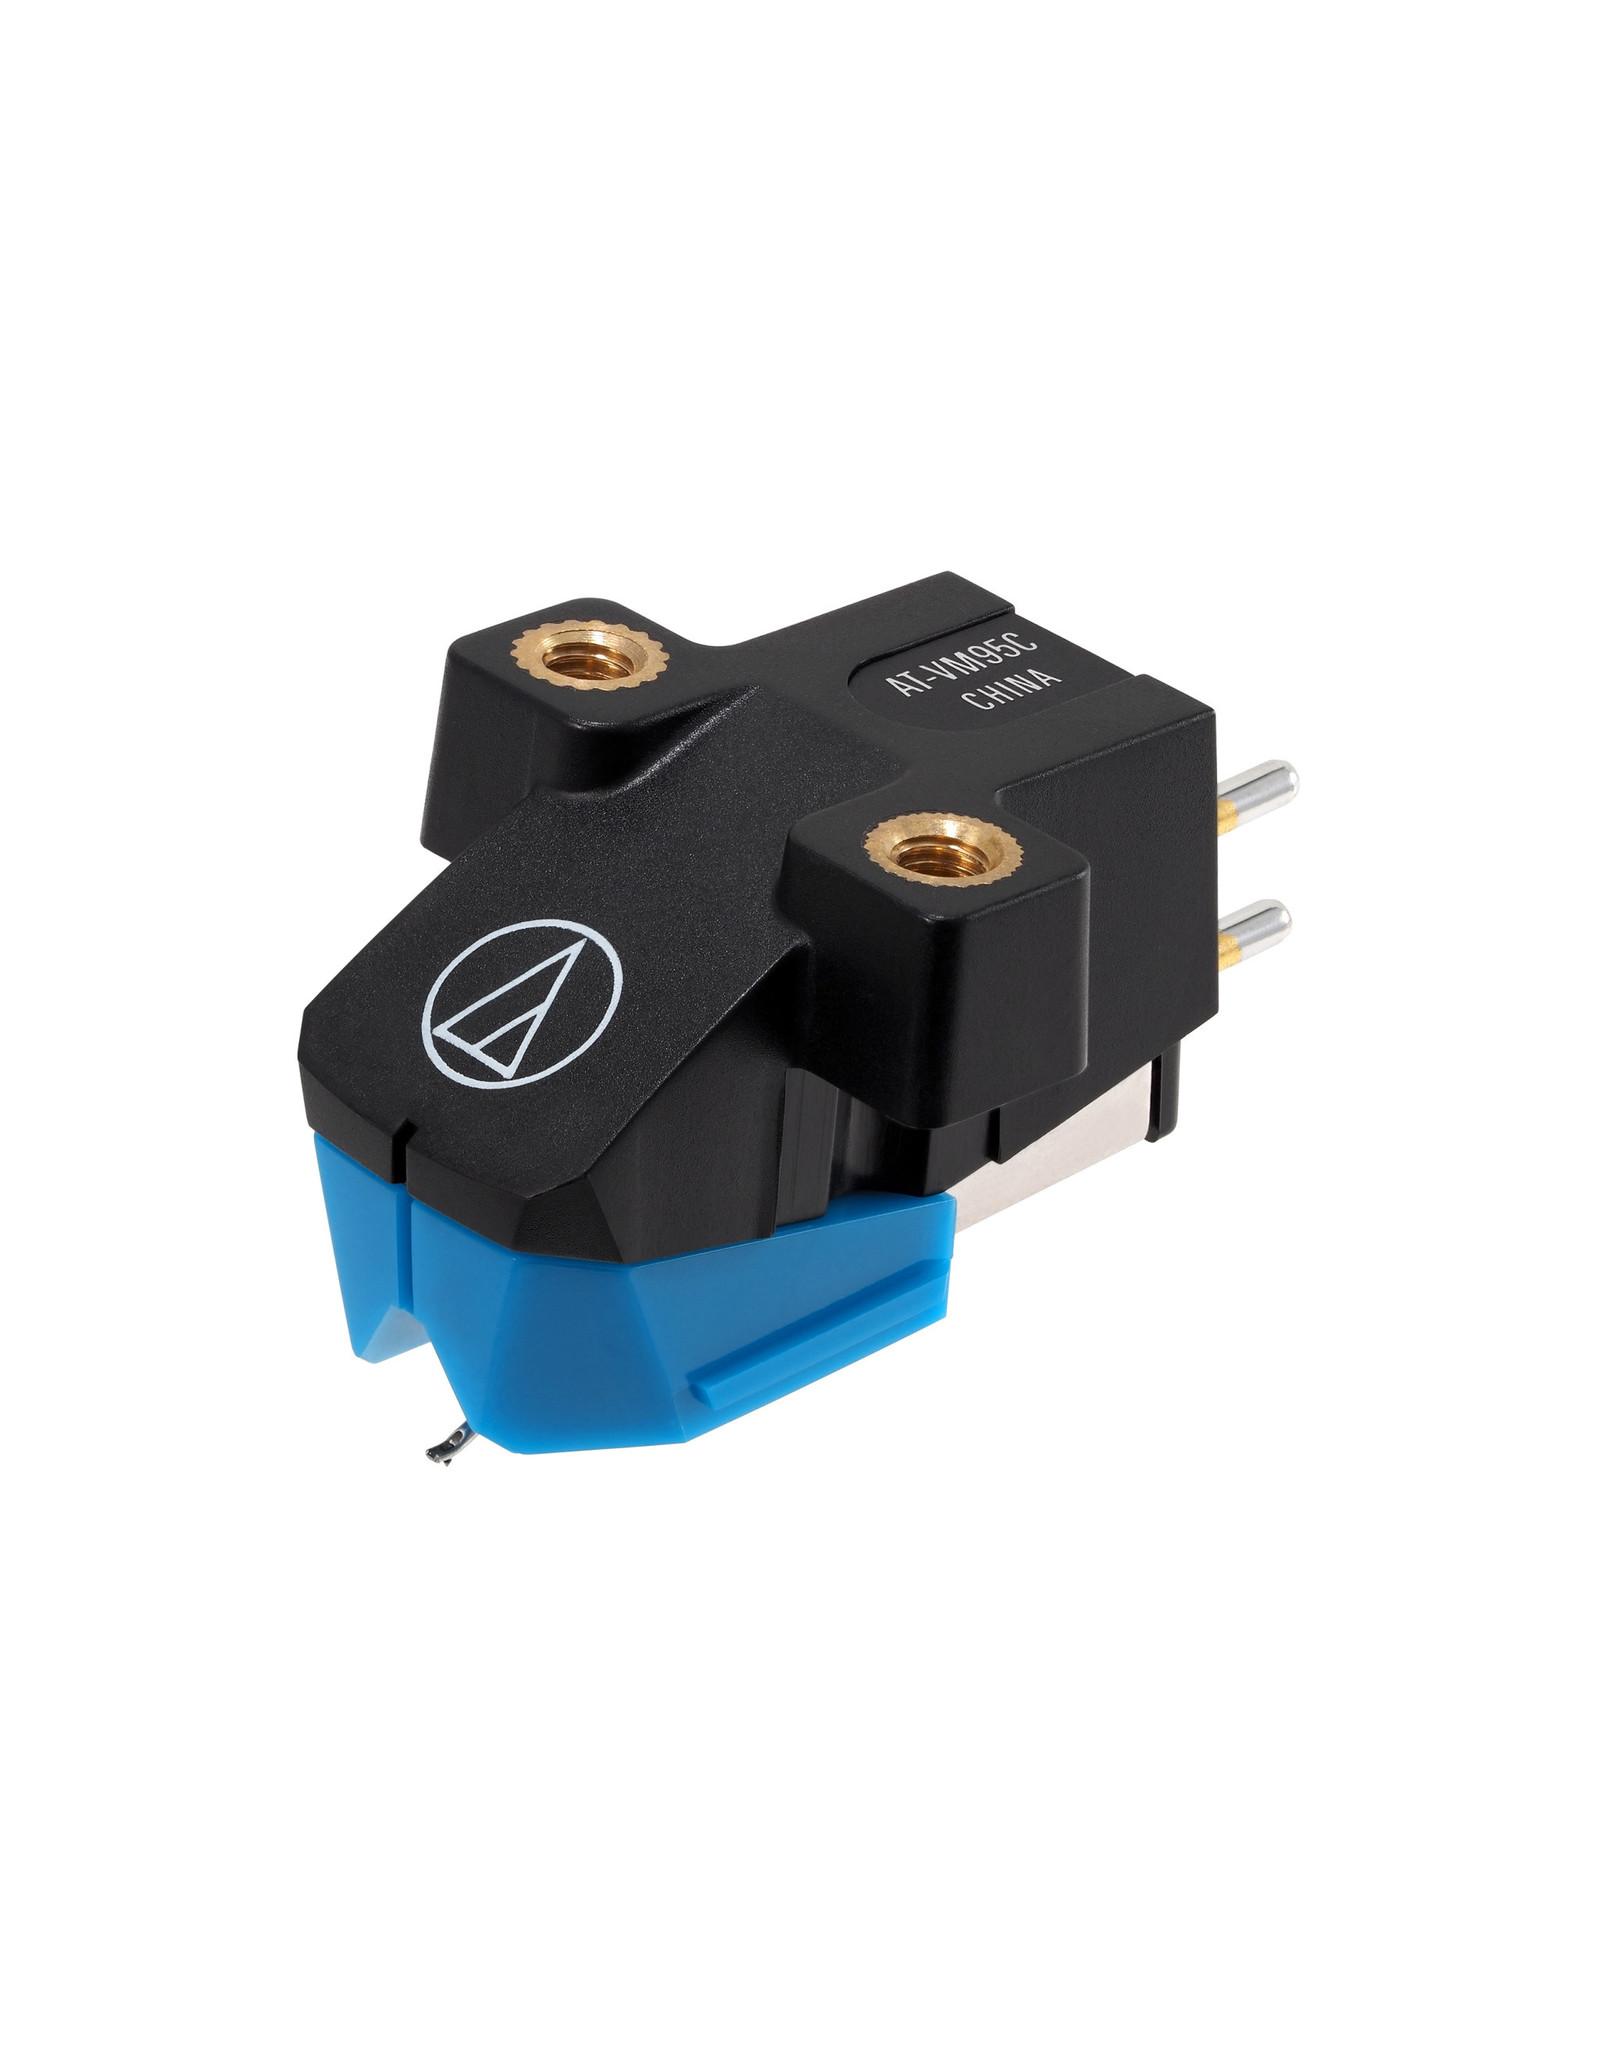 Audio-Technica Audio-Technica AT-VM95C Phono Cartridge